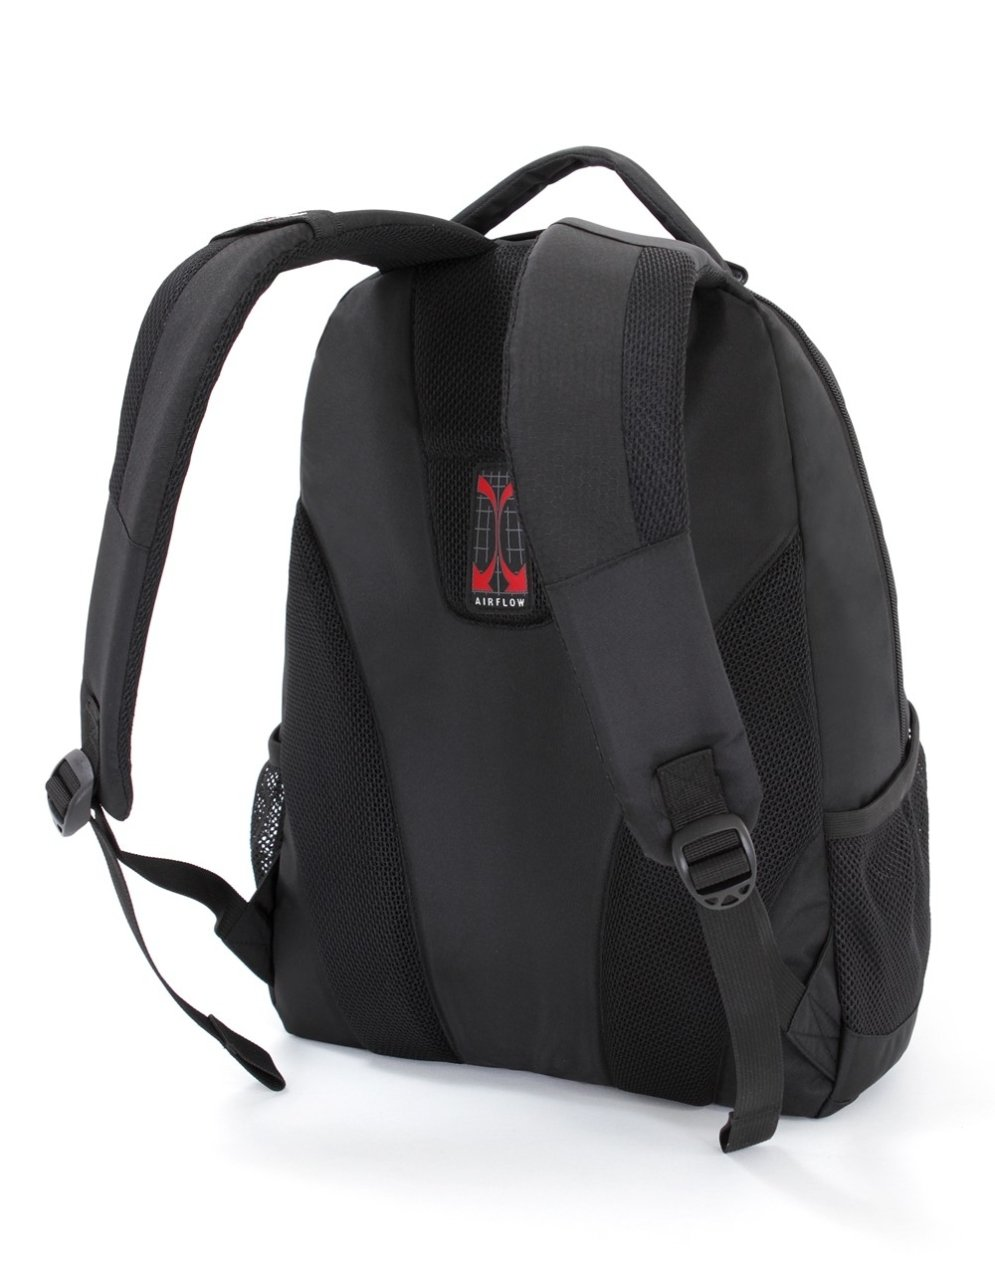 00ec7569f5757 en-ucuz-swissgear-6906201408-sa6906-sirt-cantasi-srt-antas-swissgear-backpack-12920-96-b.jpg?revision=1559210572